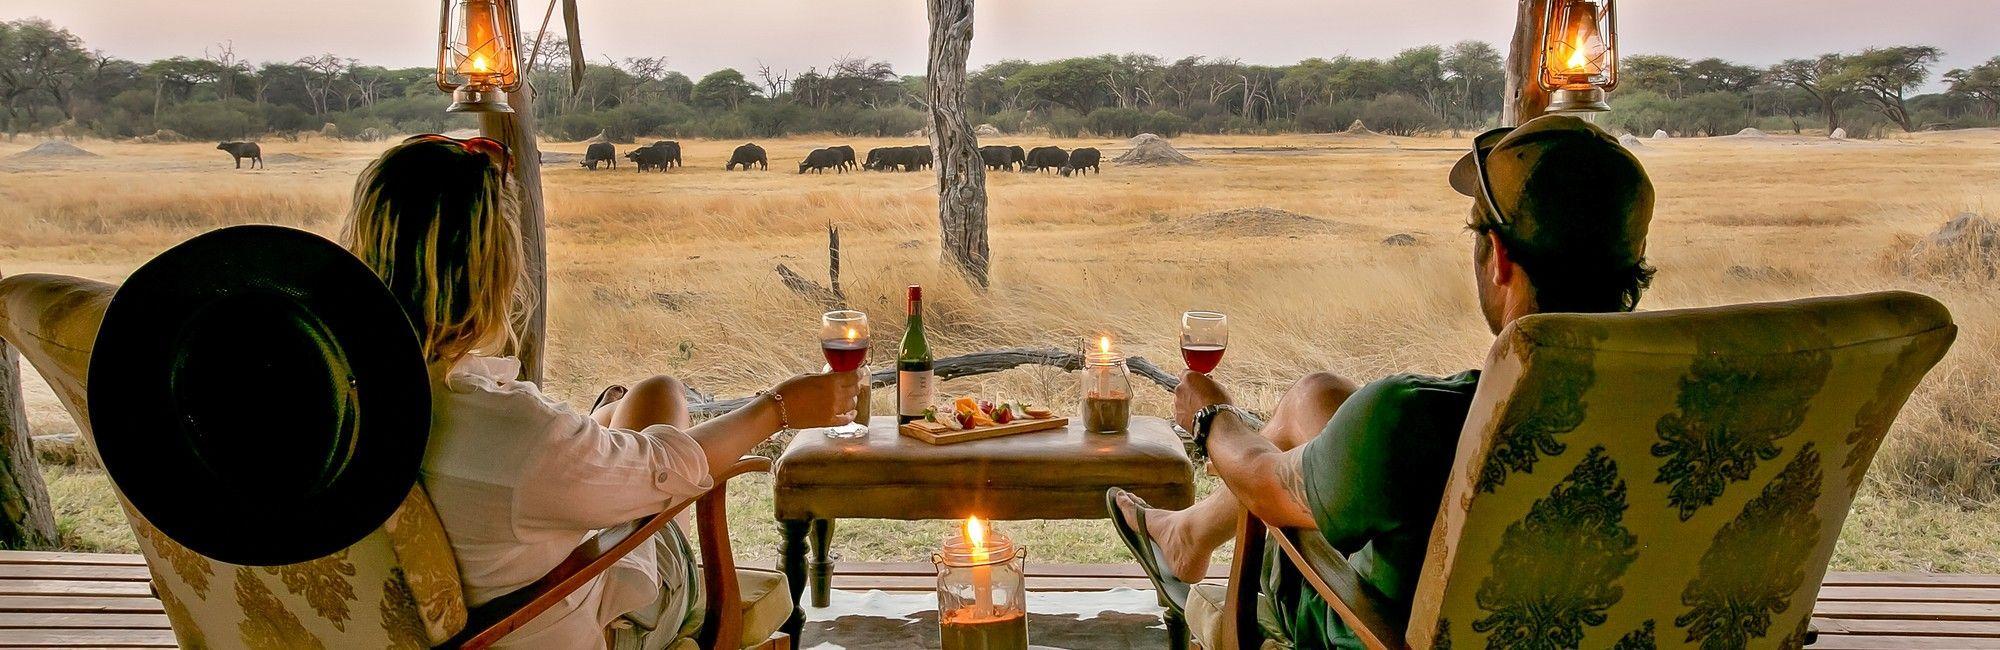 Luxe reizen Zimbabwe